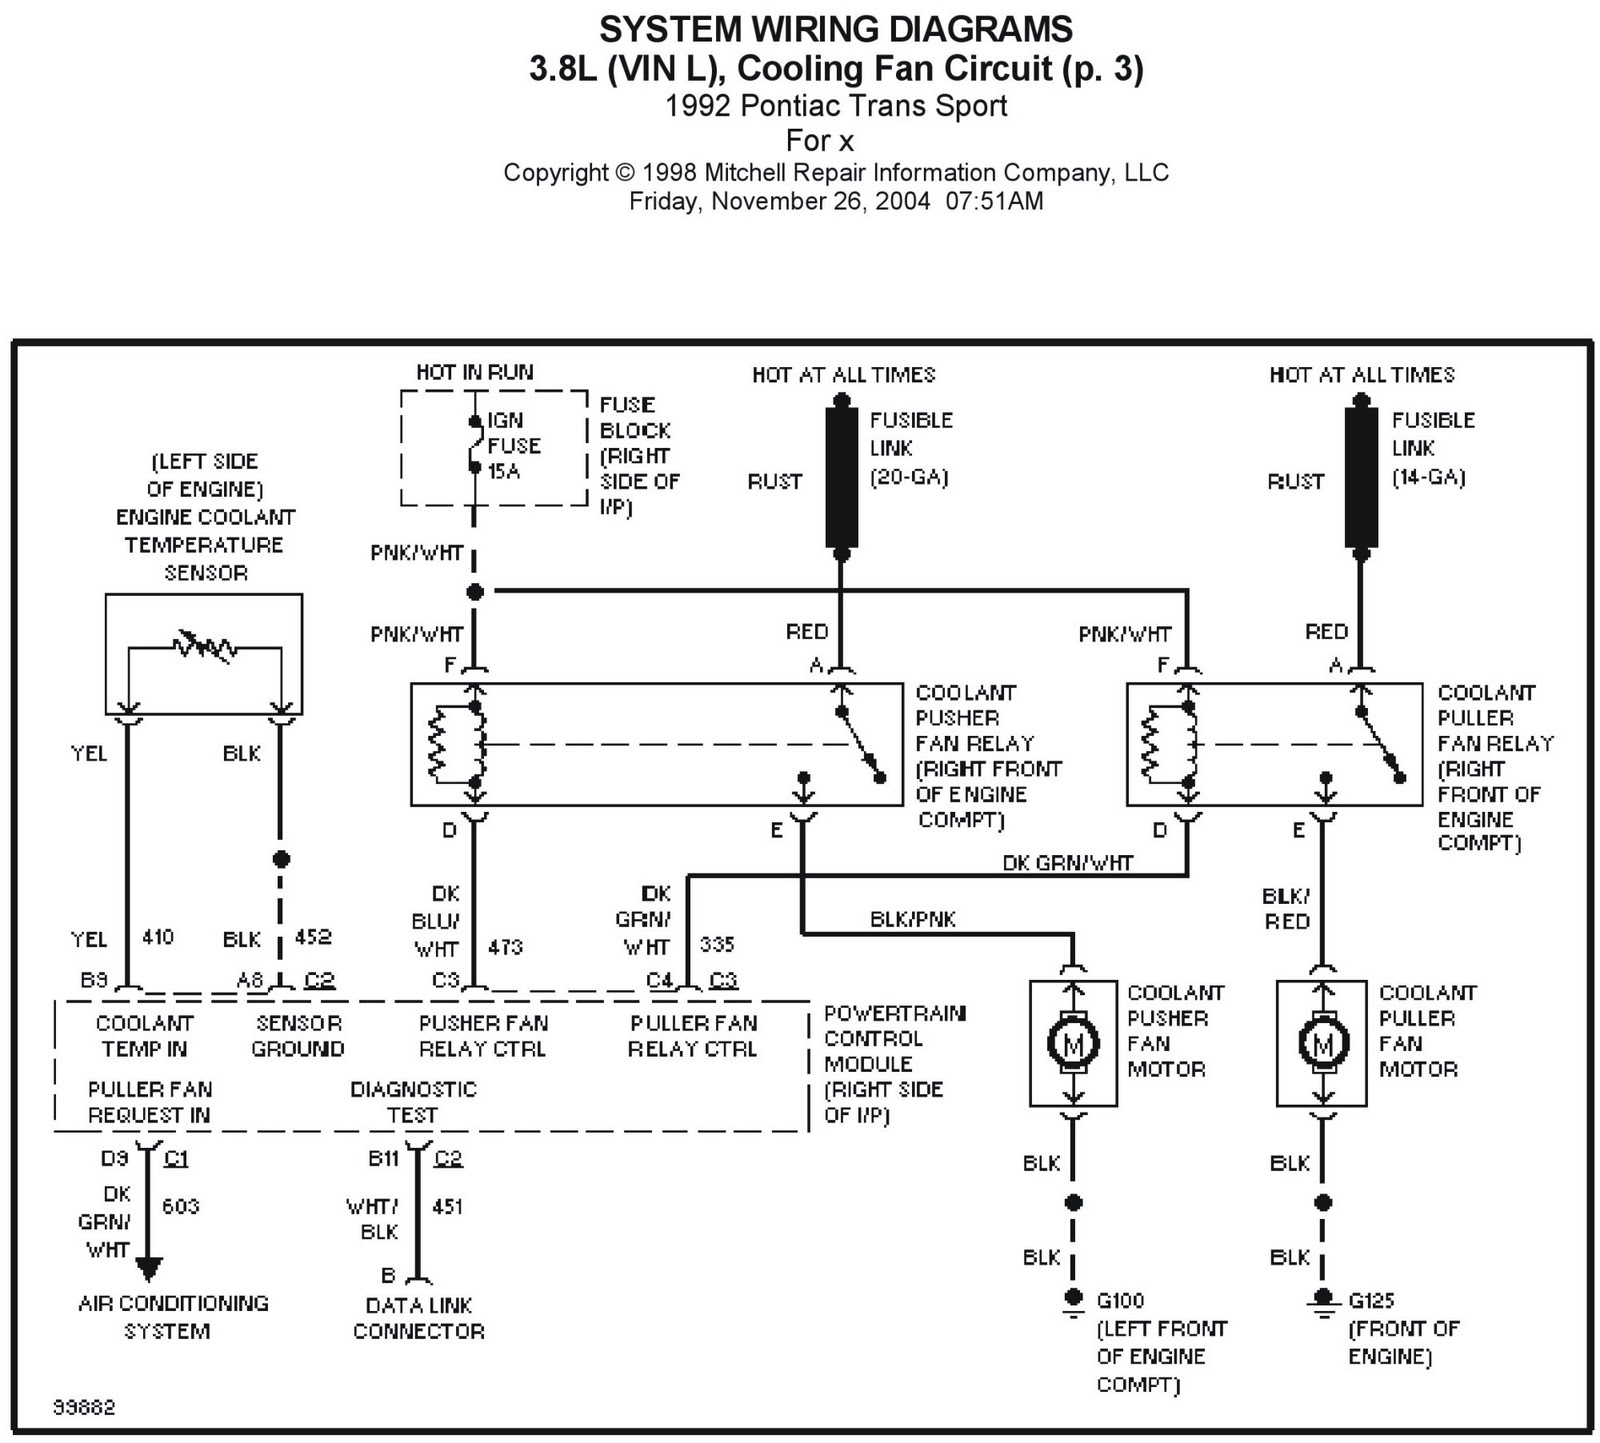 98 Pontiac Grand Am Cooling Fan Wiring Diagram Auto Electrical Trans Fuse Box 1992 Sport 3 8l Vin L Circuit